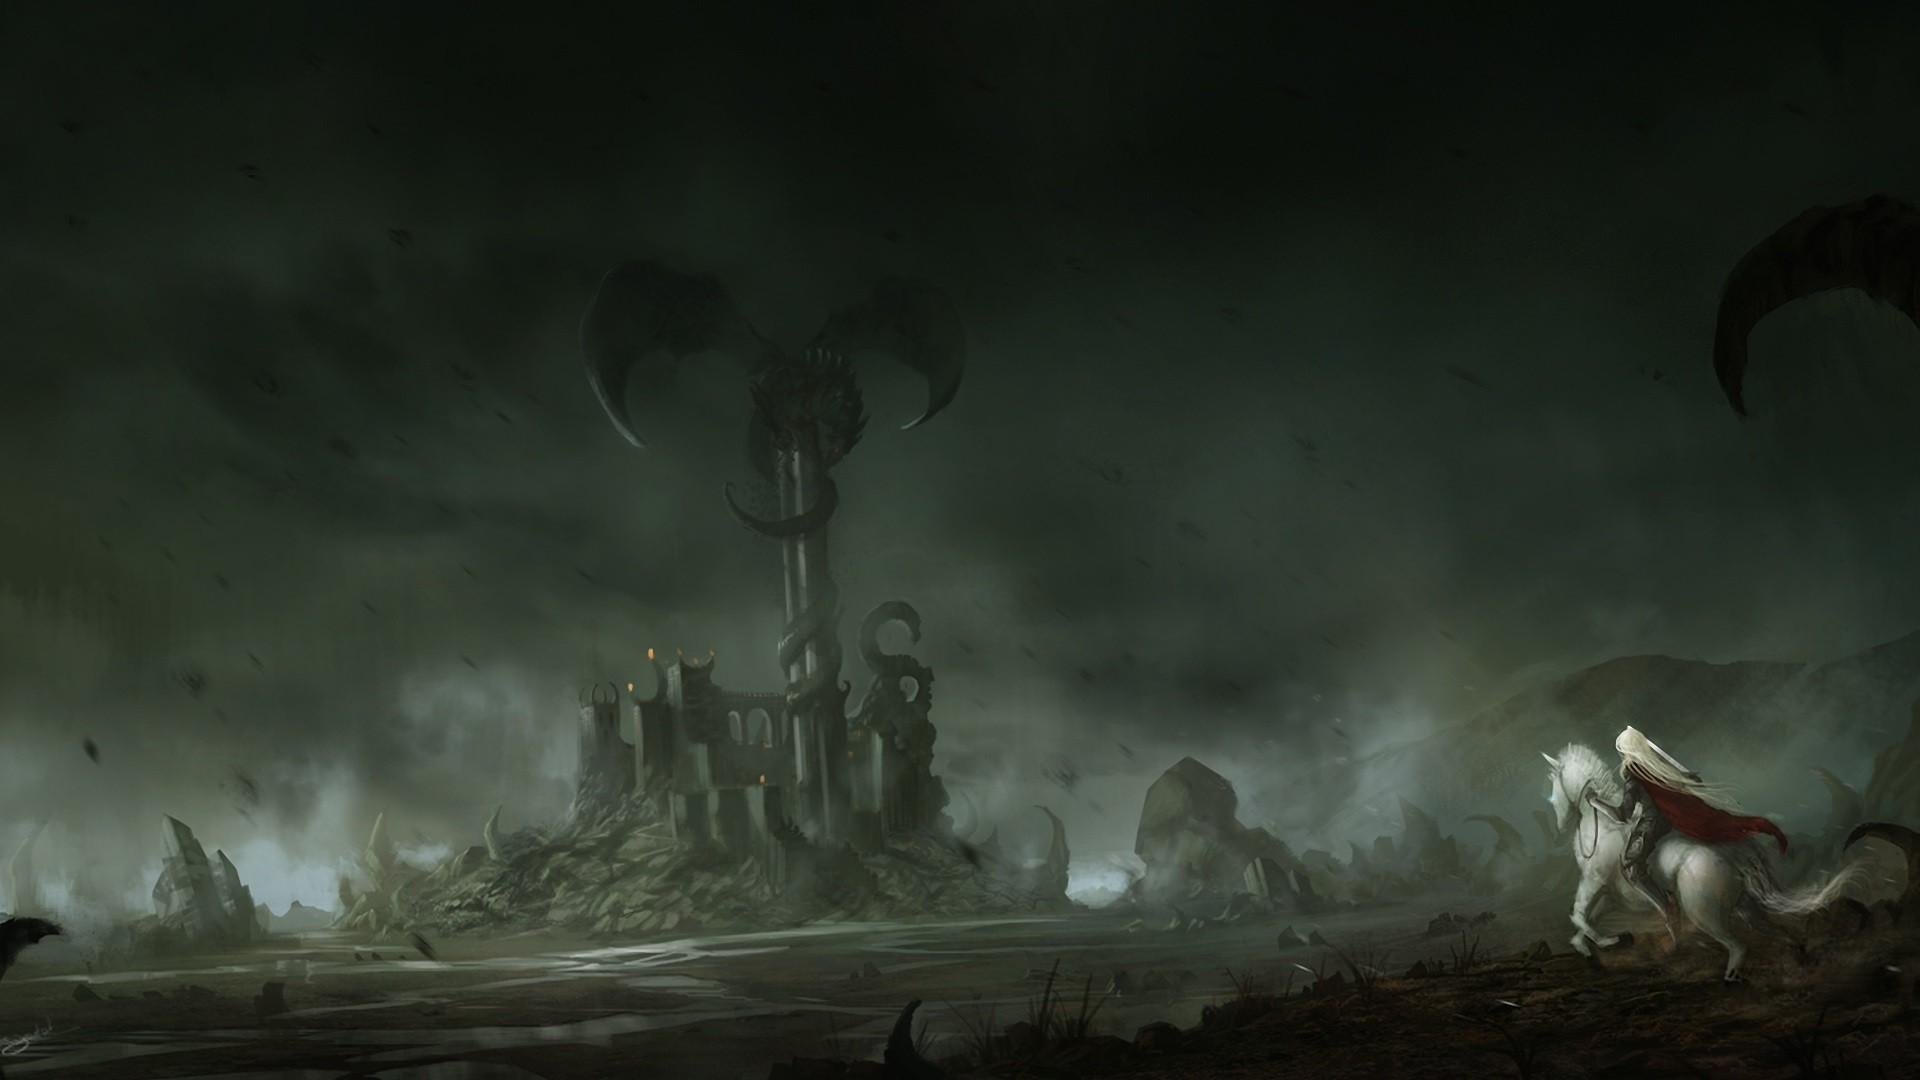 Women Fantasy Art Dark Knight Castle Dragon Warrior Thunder Ghost Ship Darkness Screenshot Computer Wallpaper Fictional